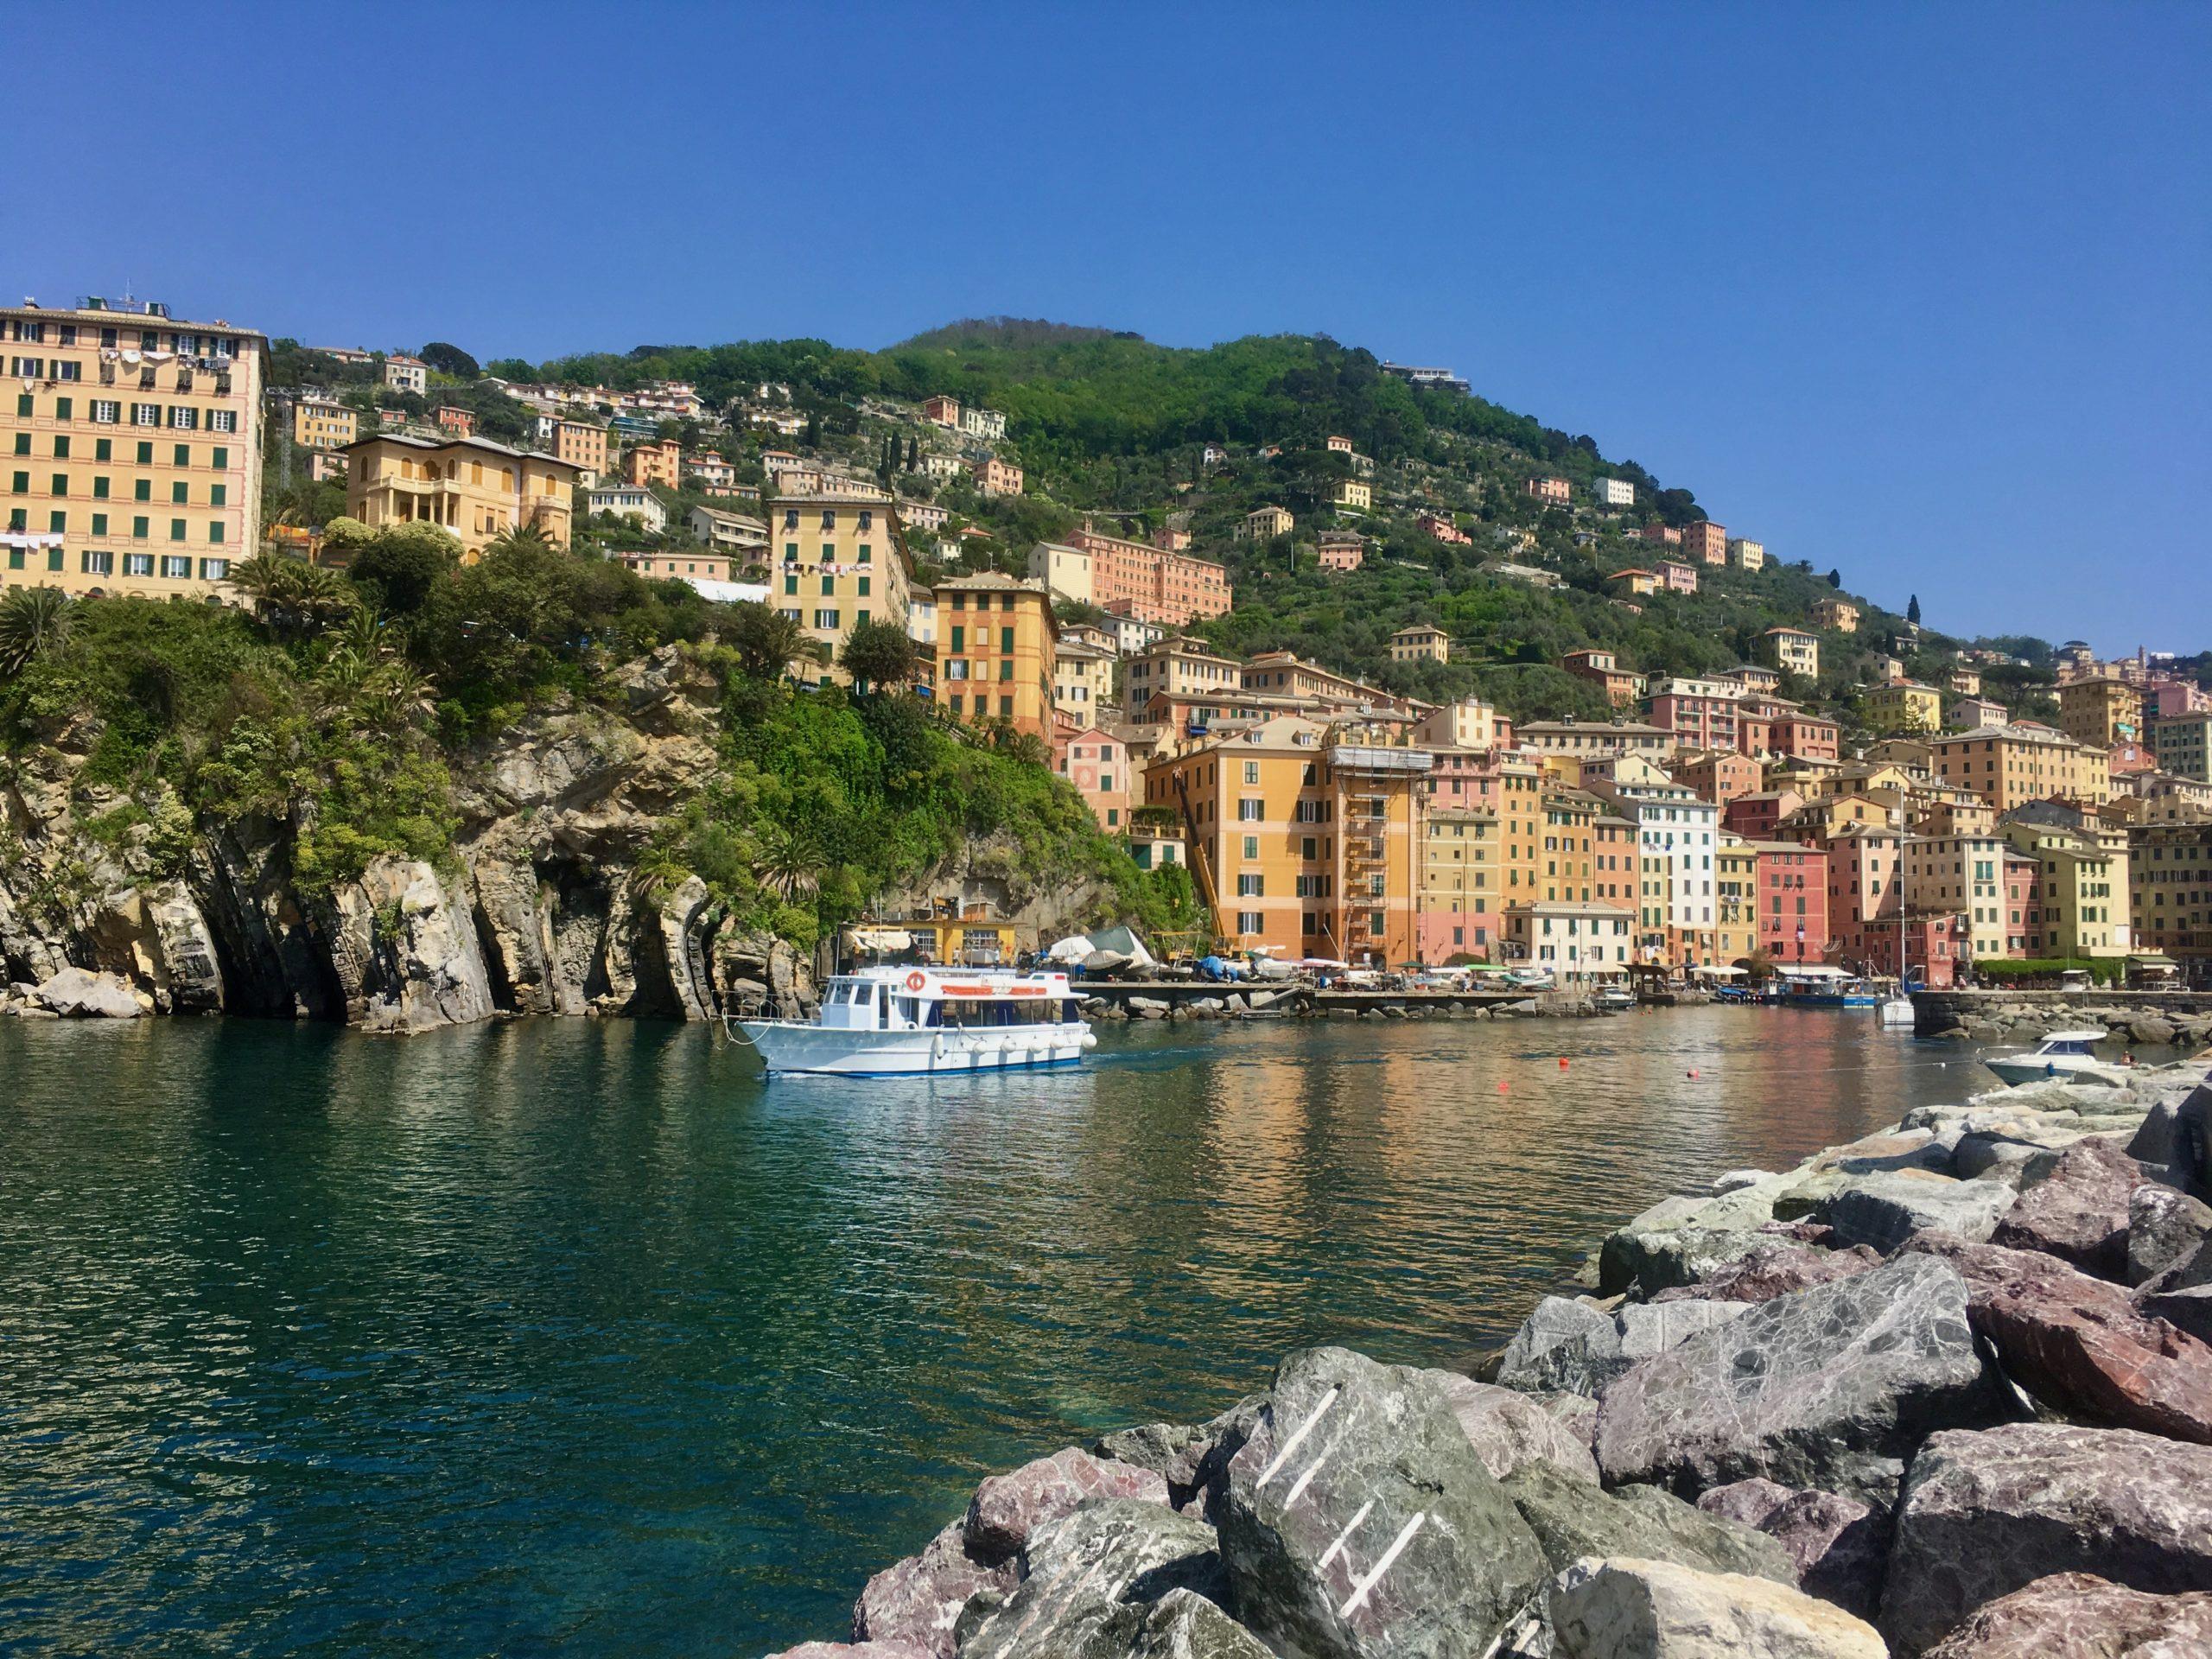 Liguria ciekawe miejsca